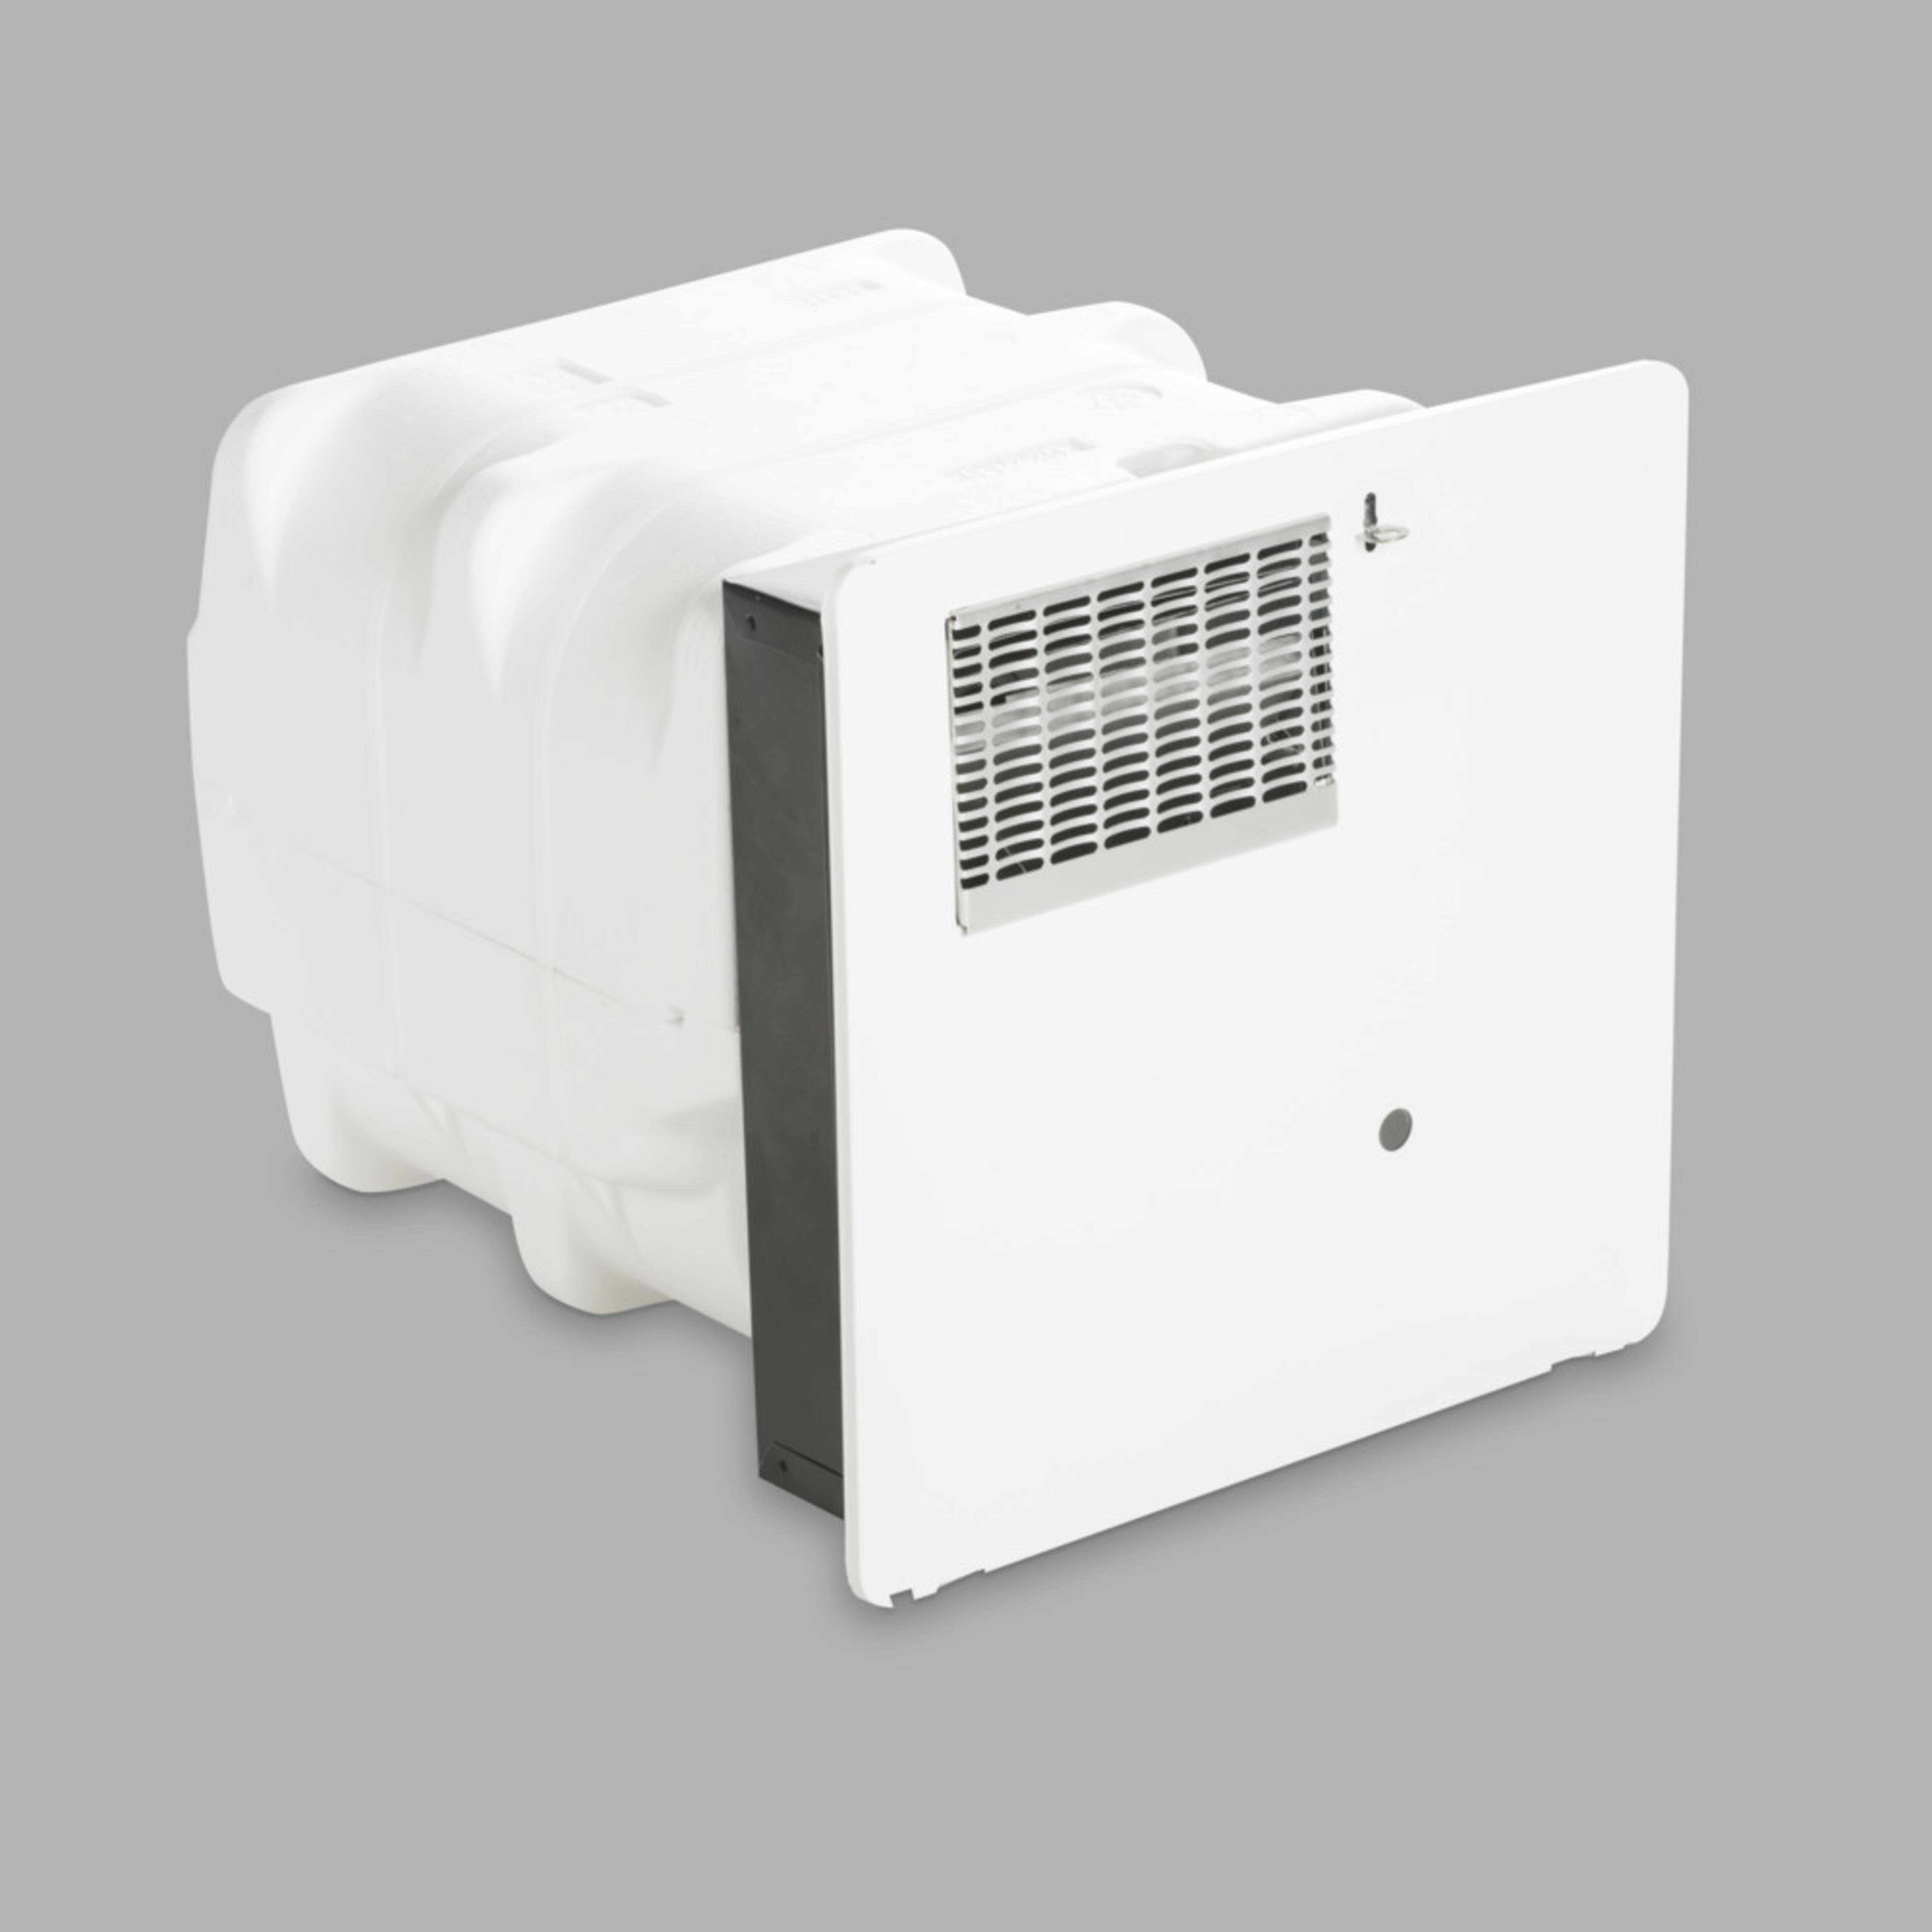 Dometic Atwood Water Heater Access Door